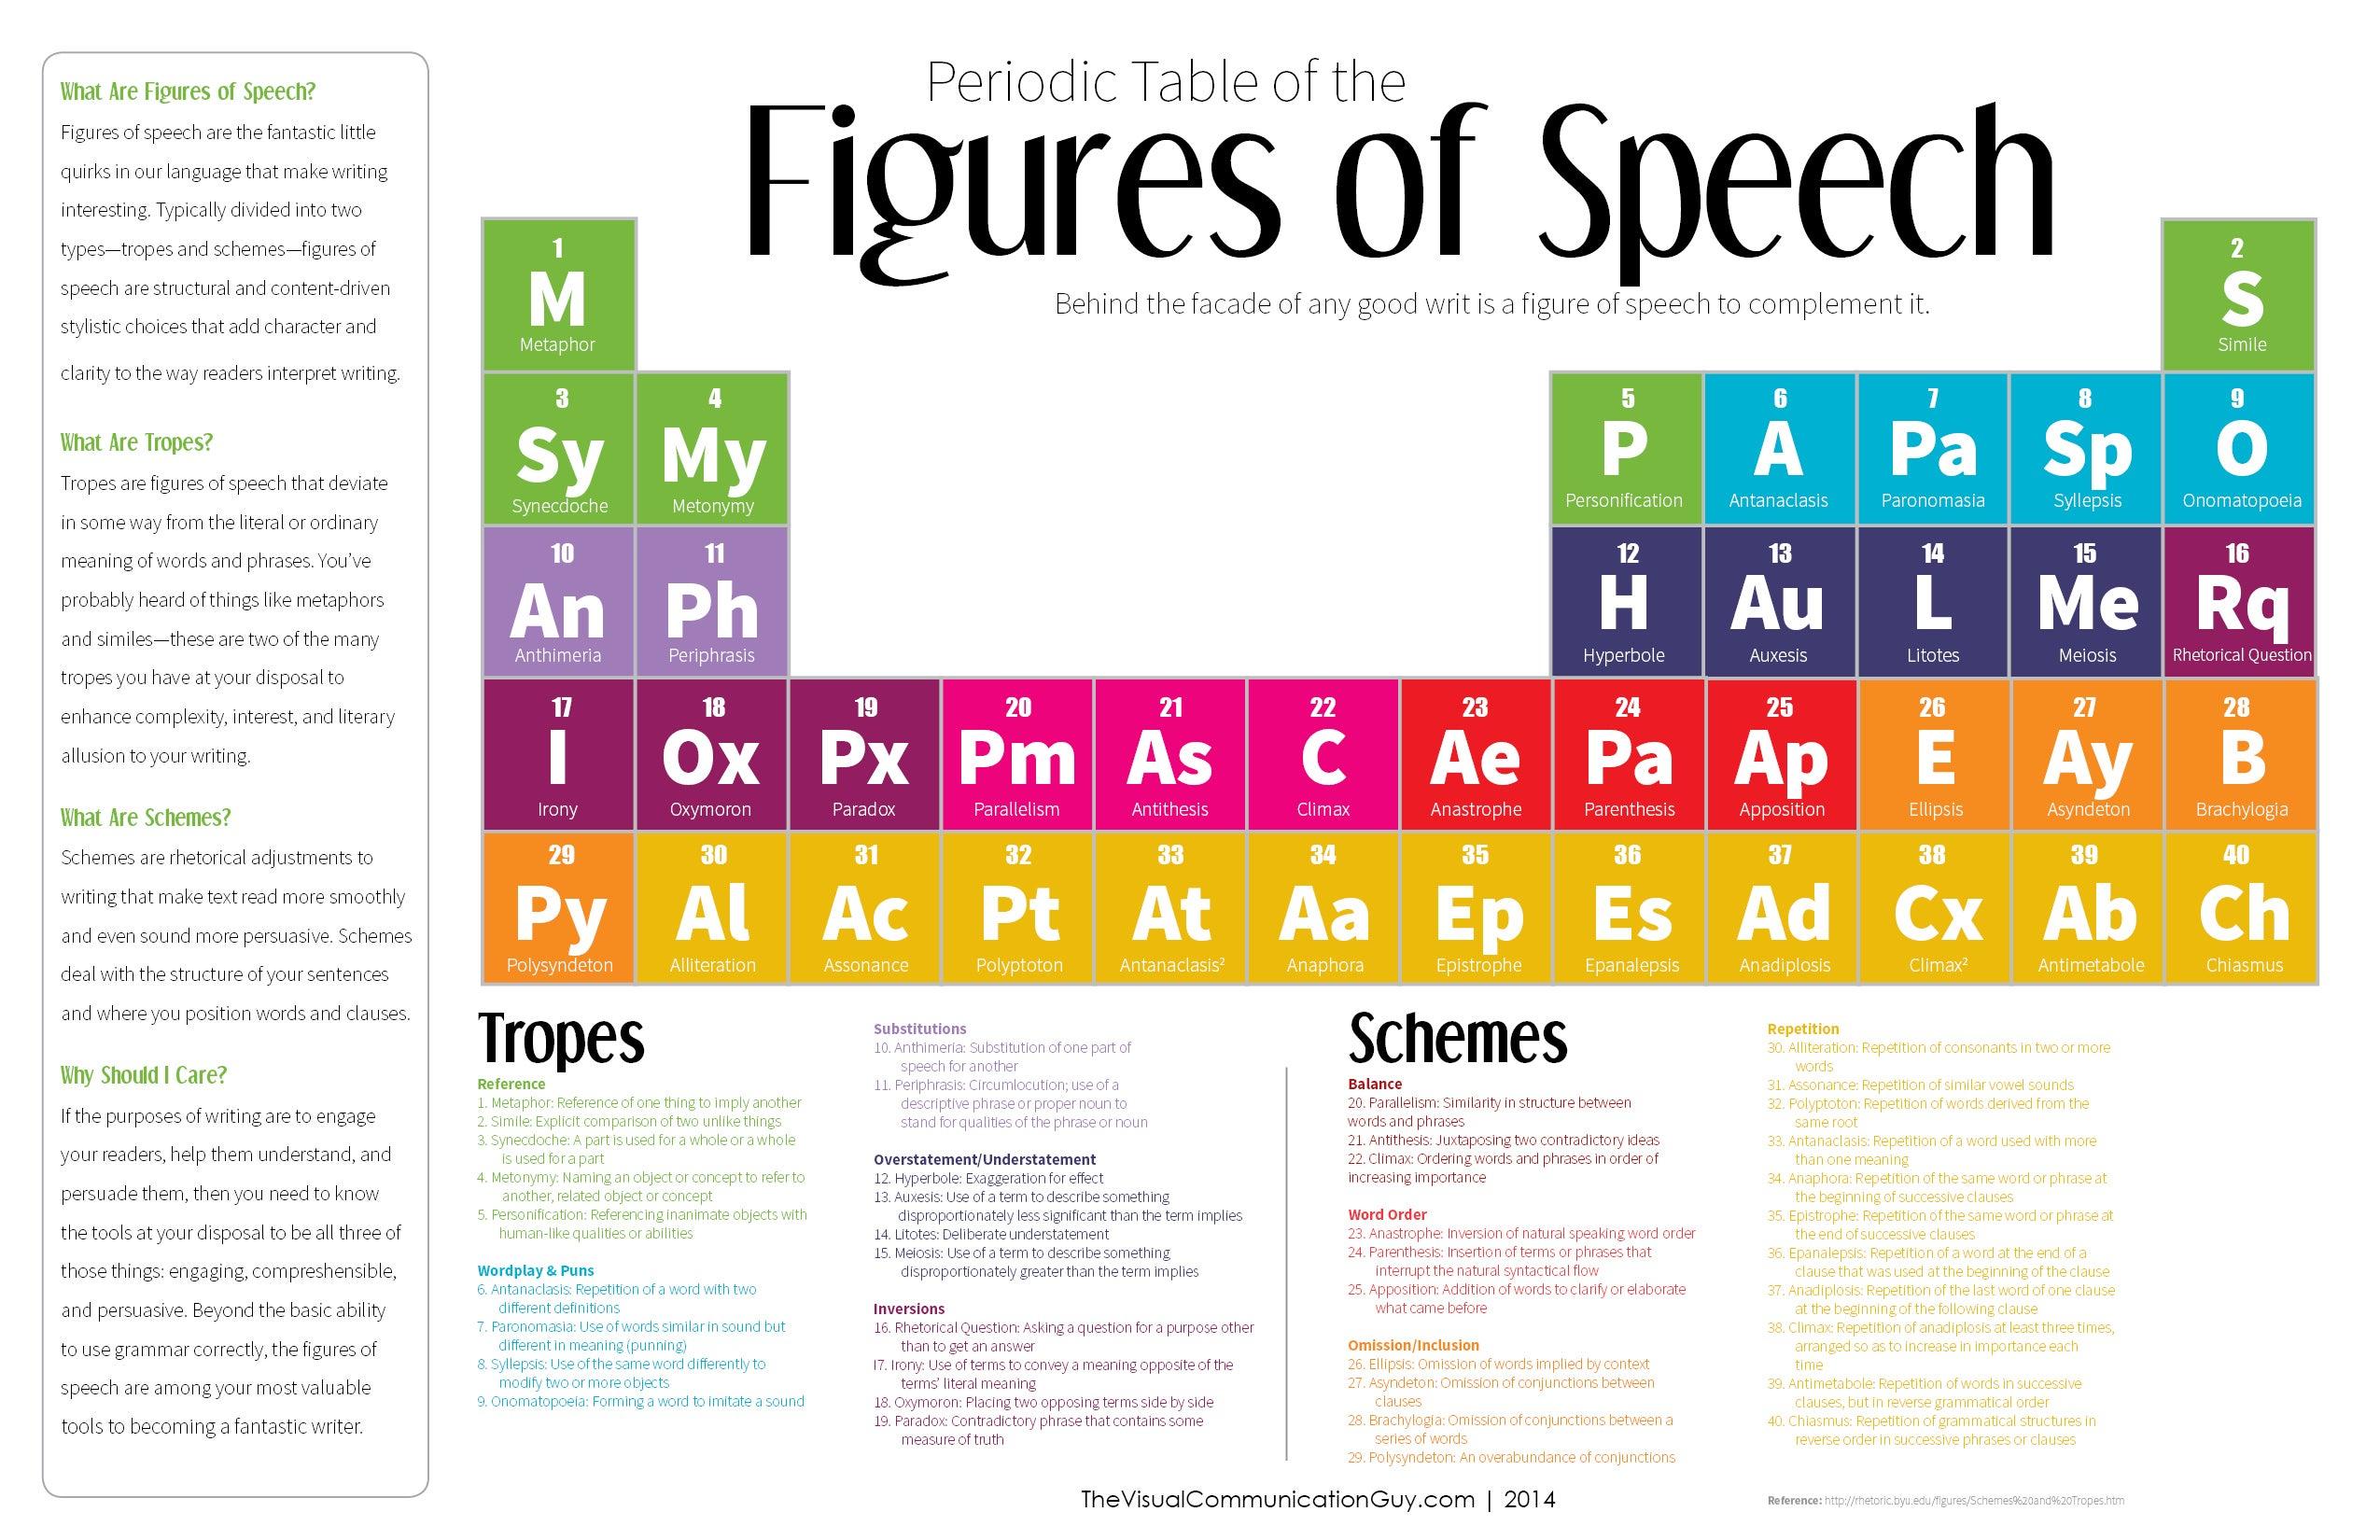 9 main figures of speech